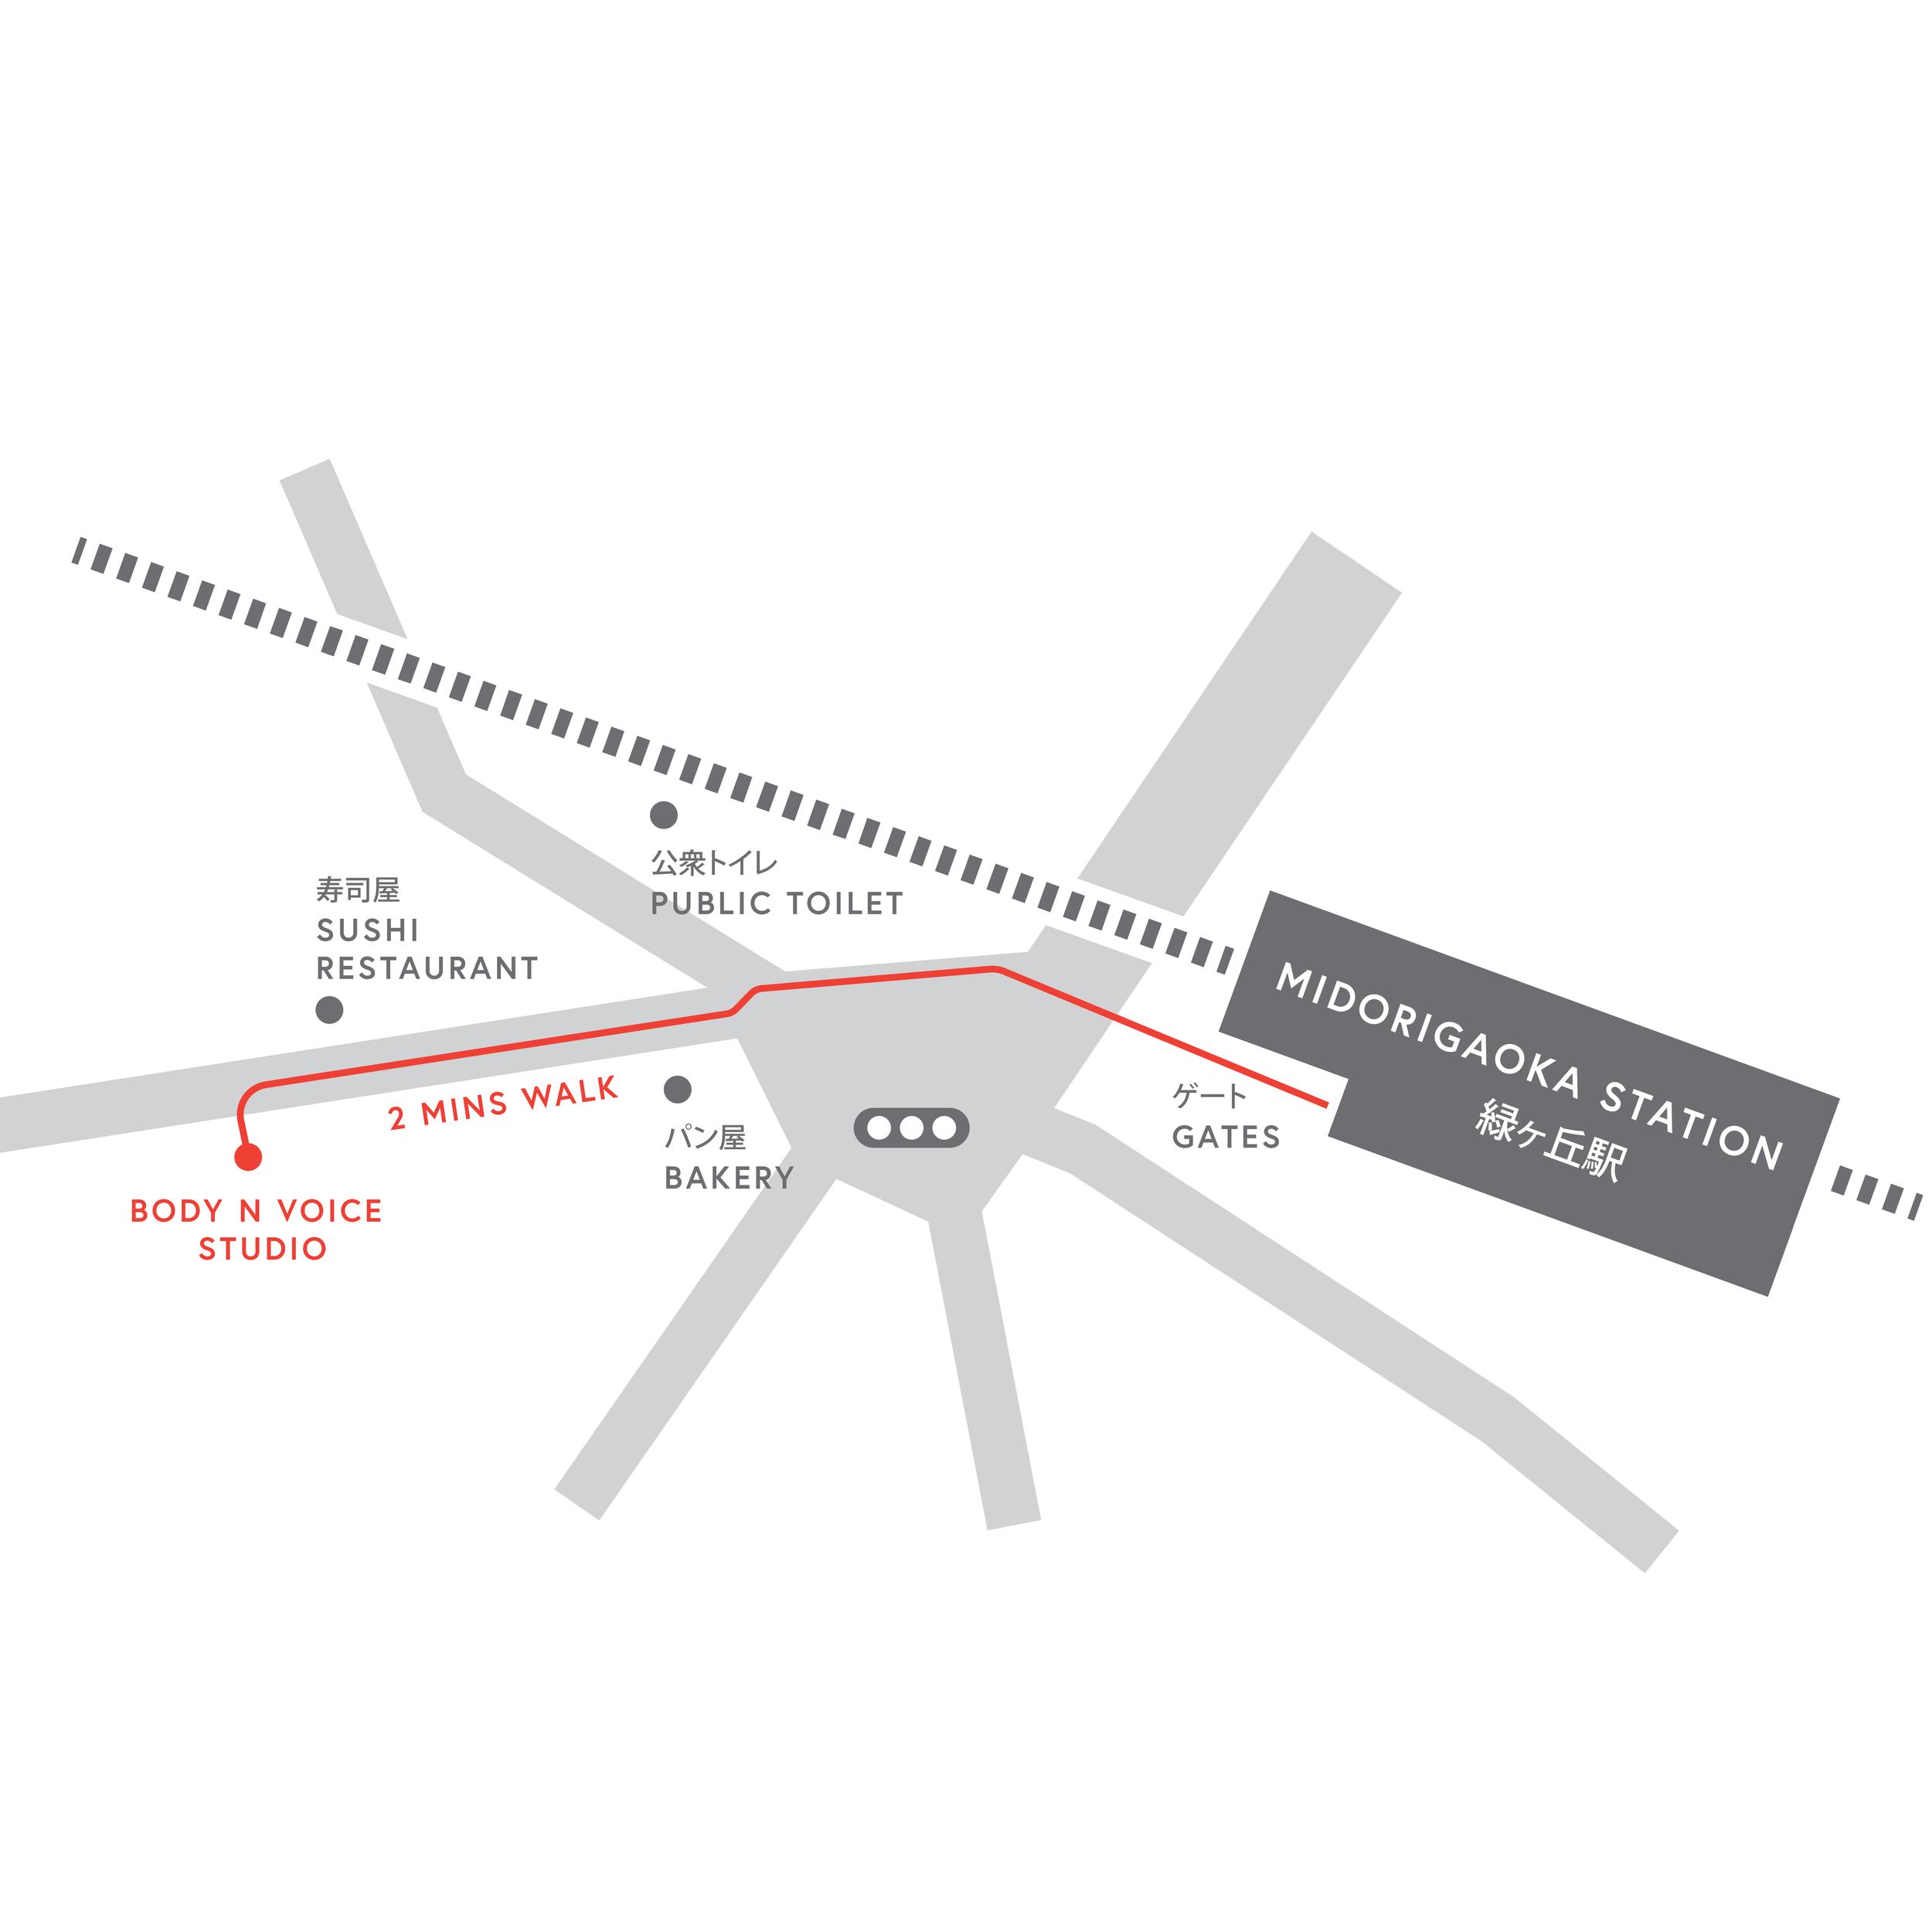 Midorigaoka - A 2 minute walk from Midorigaoka Station, also on the Tokyu Oimachi Line.